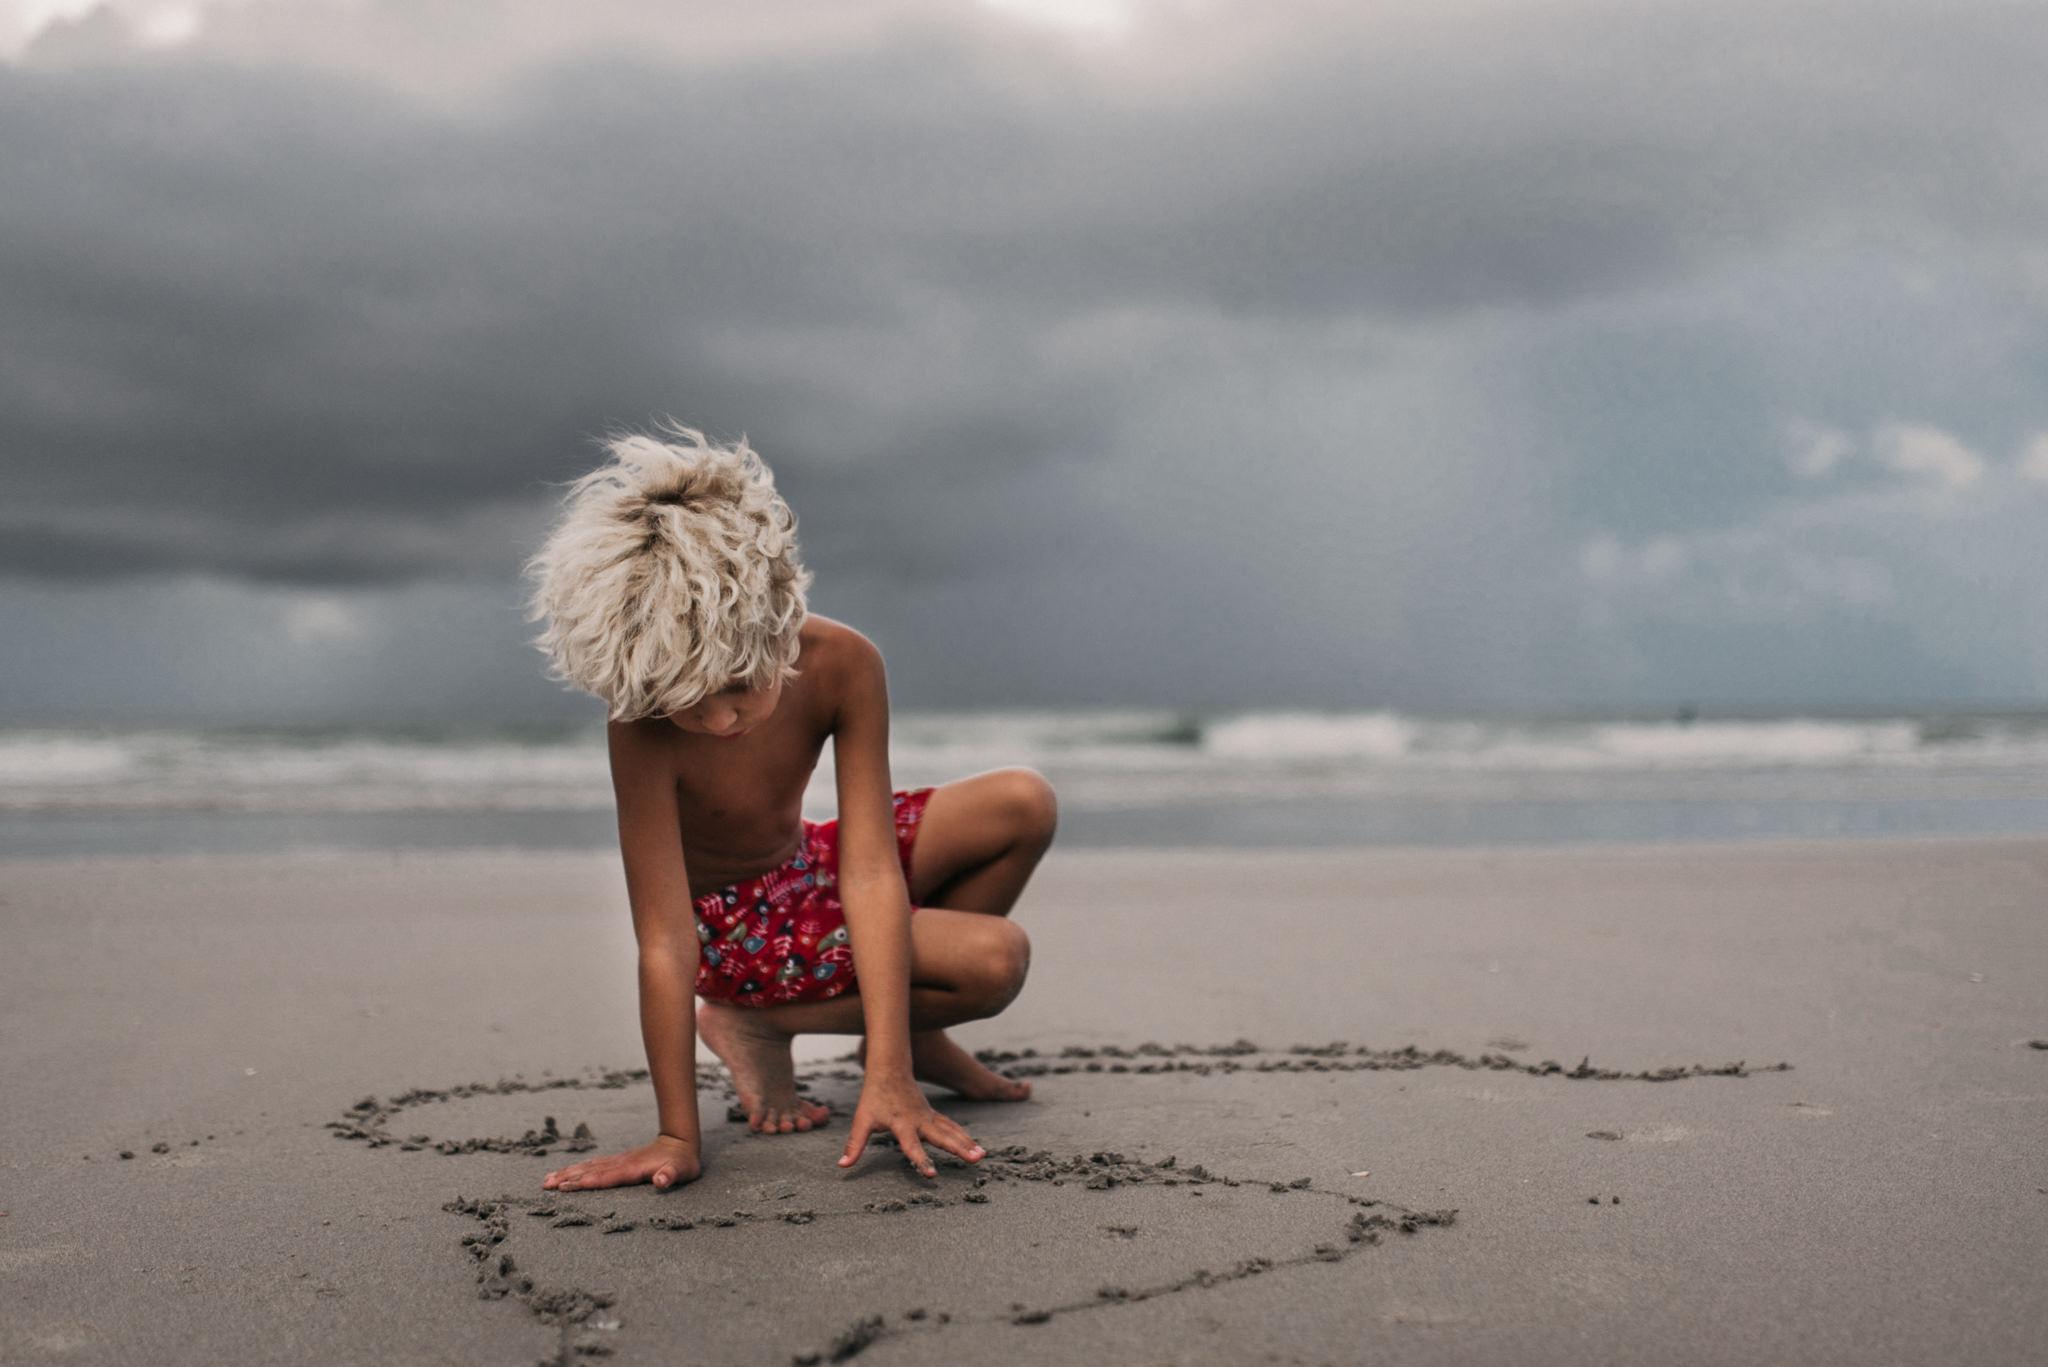 twyla jones photography - treasure coast florida - stormy beach boy playing in sand--23.jpg